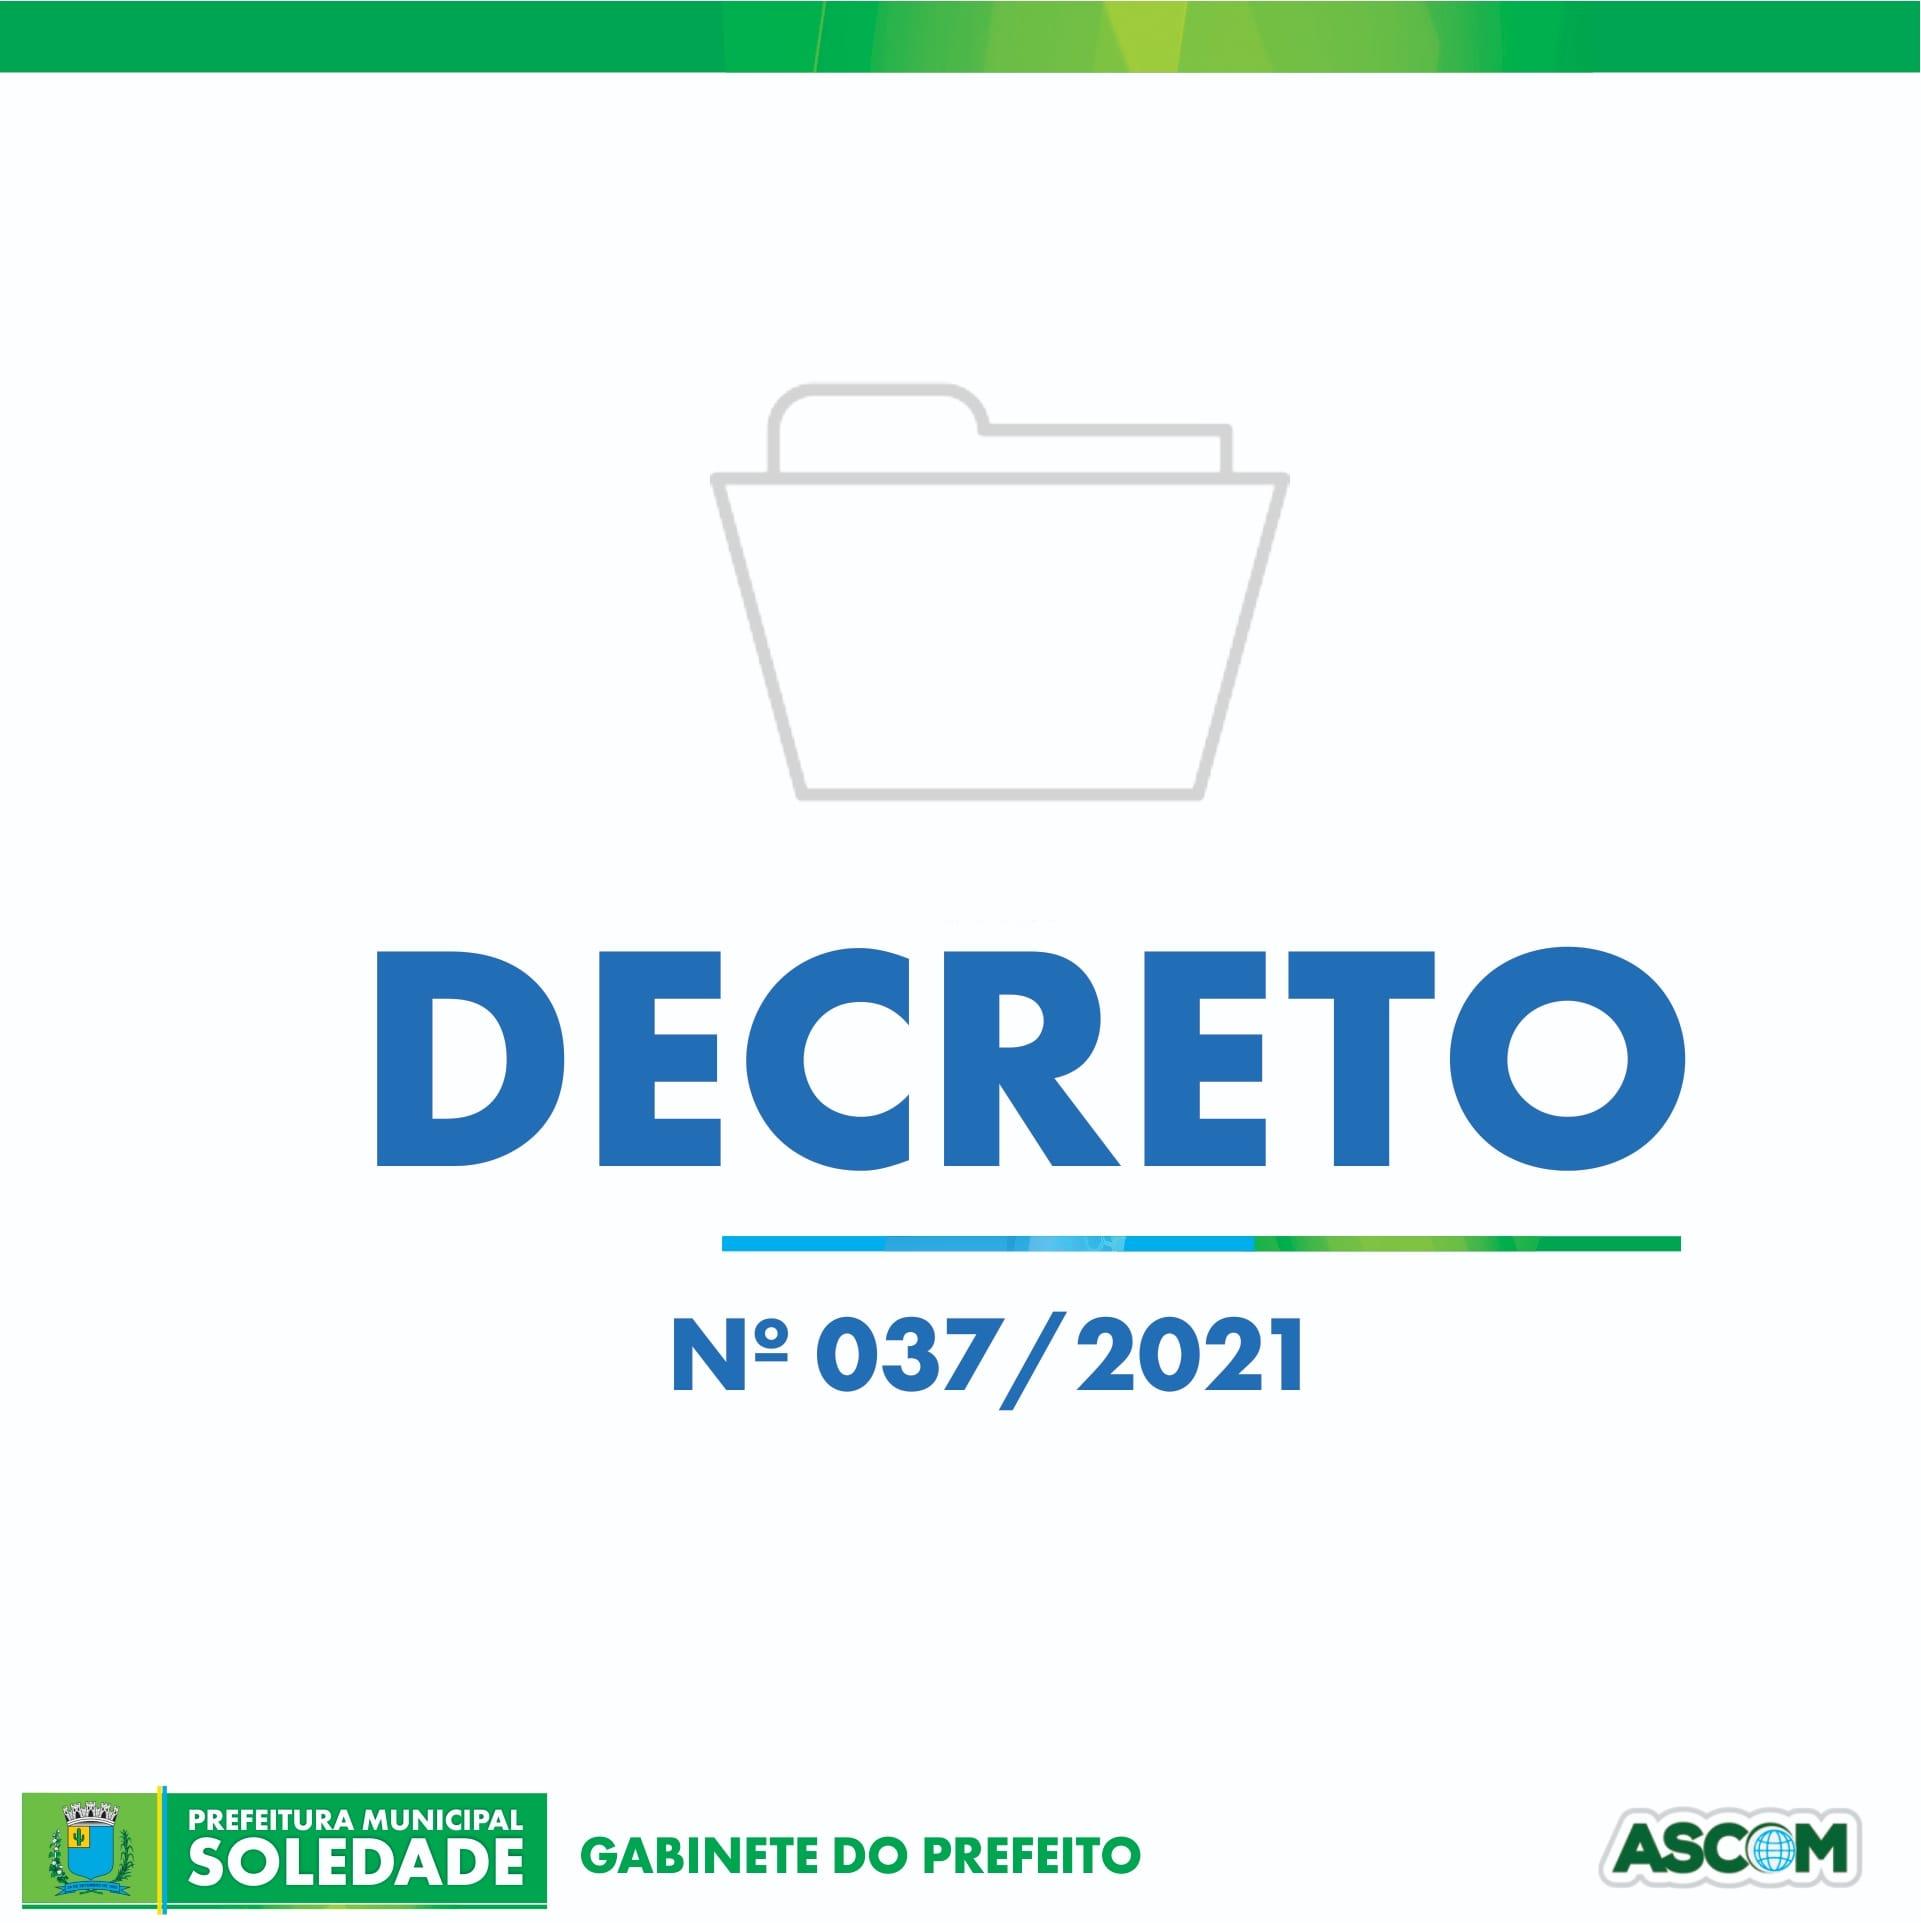 DECRETO Nº 037/2021